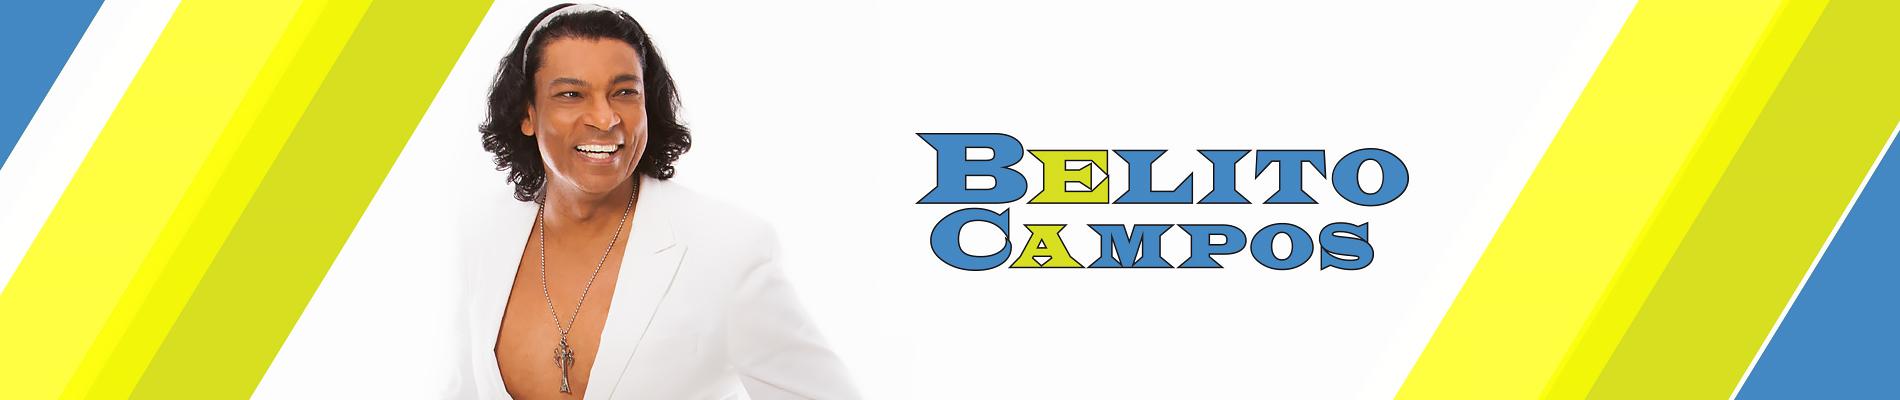 Bélito Campos